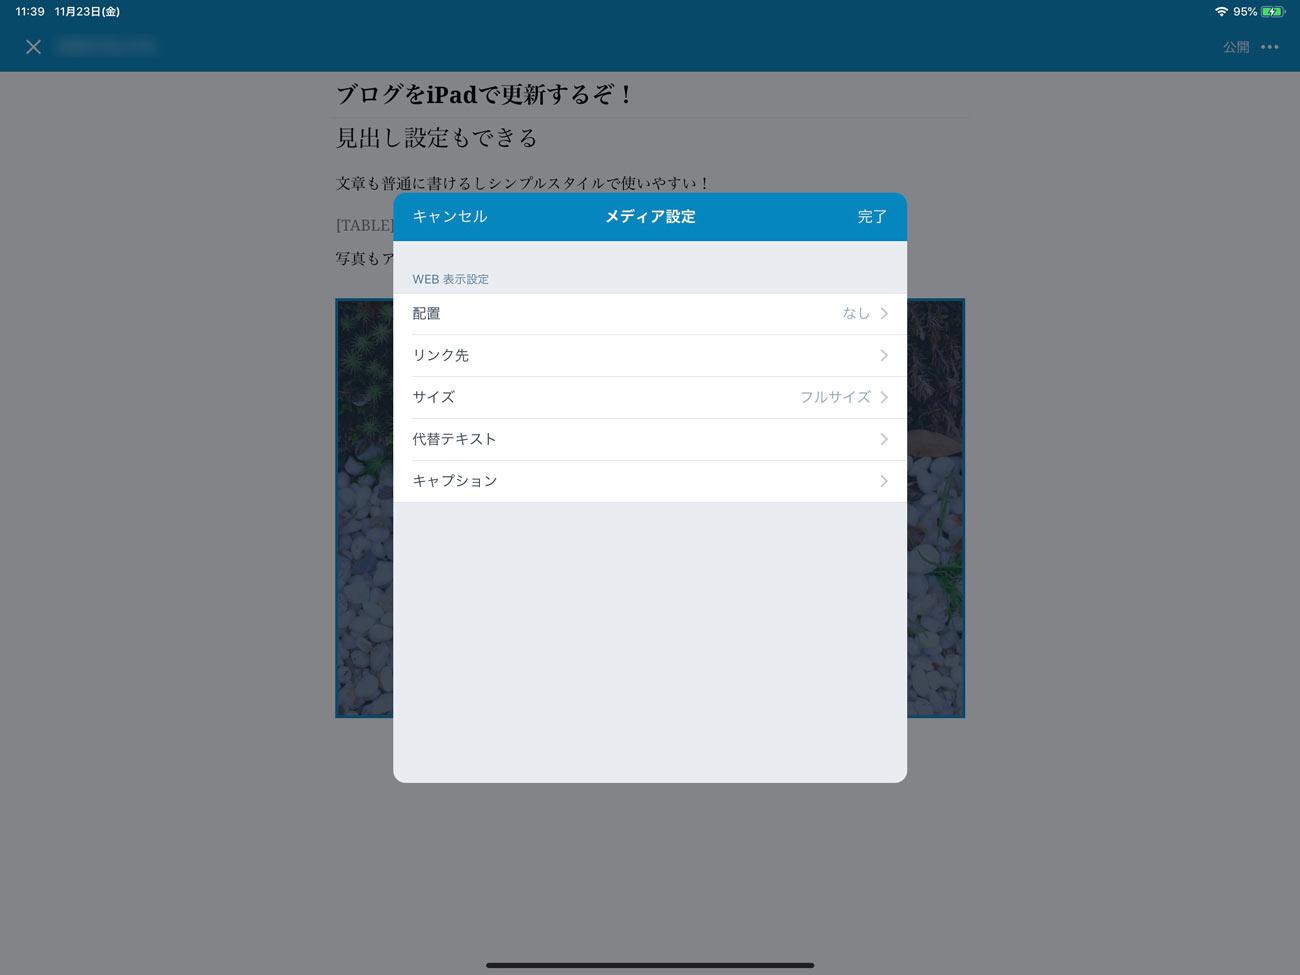 iPad版ワードプレスのアプリ ALT・キャプション設定